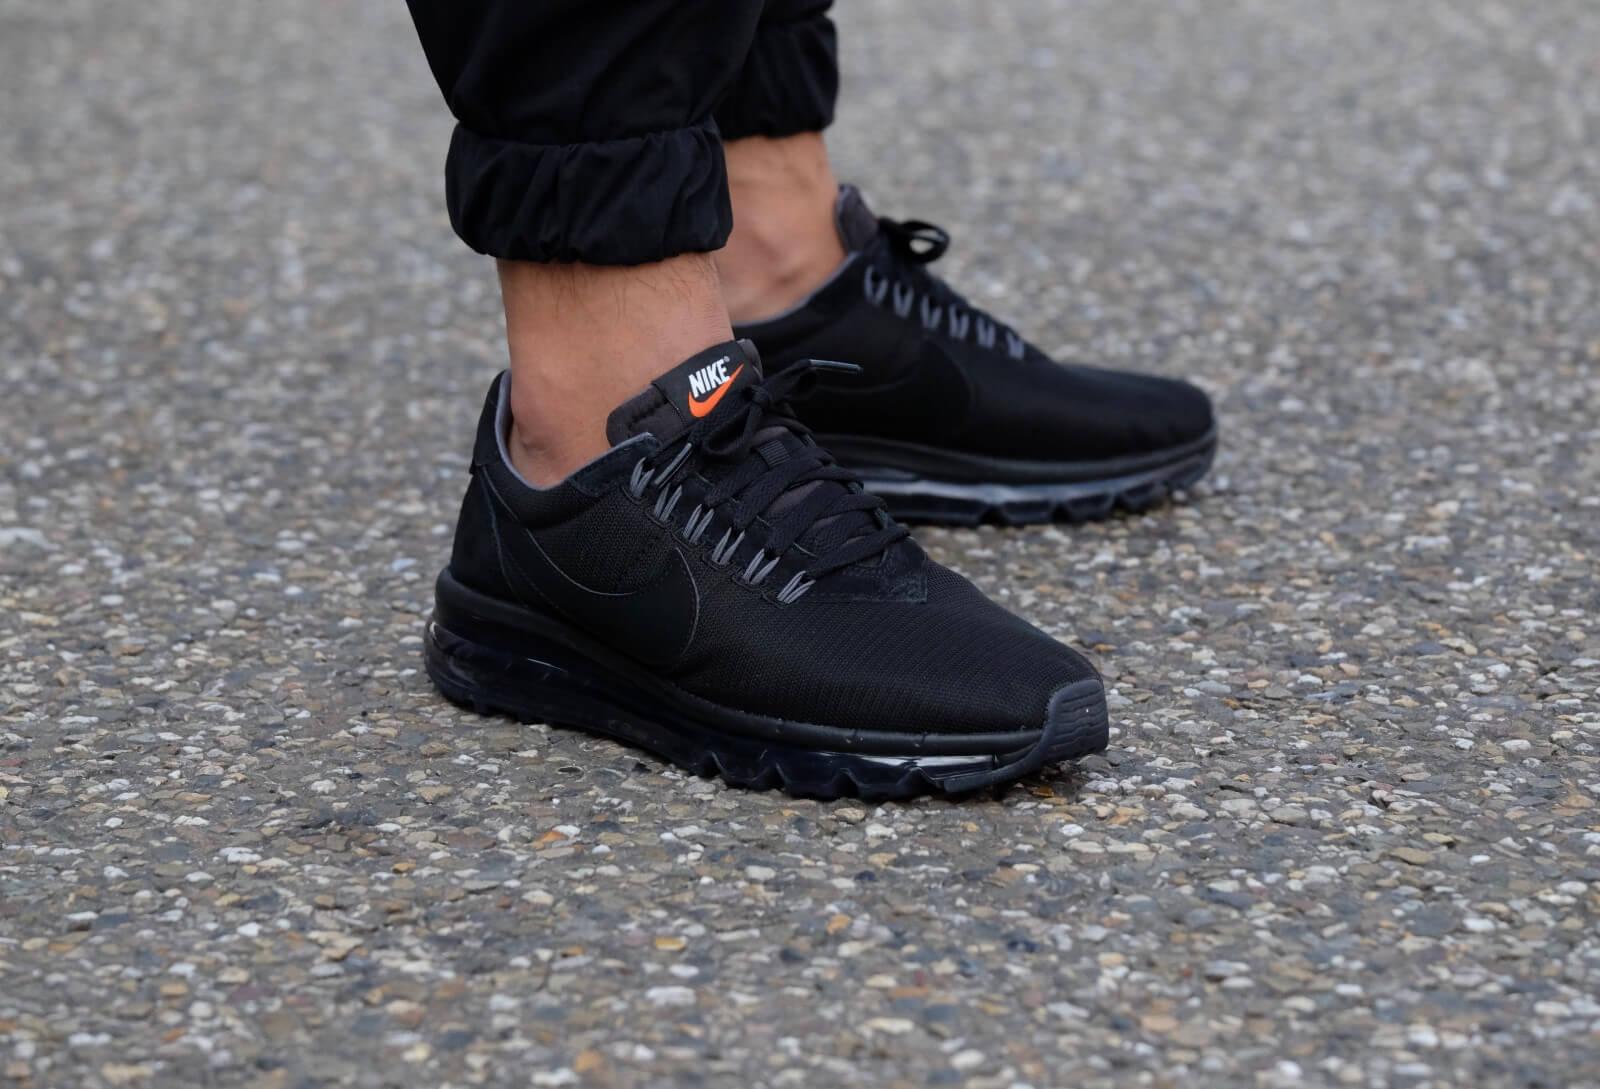 Nike Air Max LD Zero BlackBlack Dark Grey 848624 005